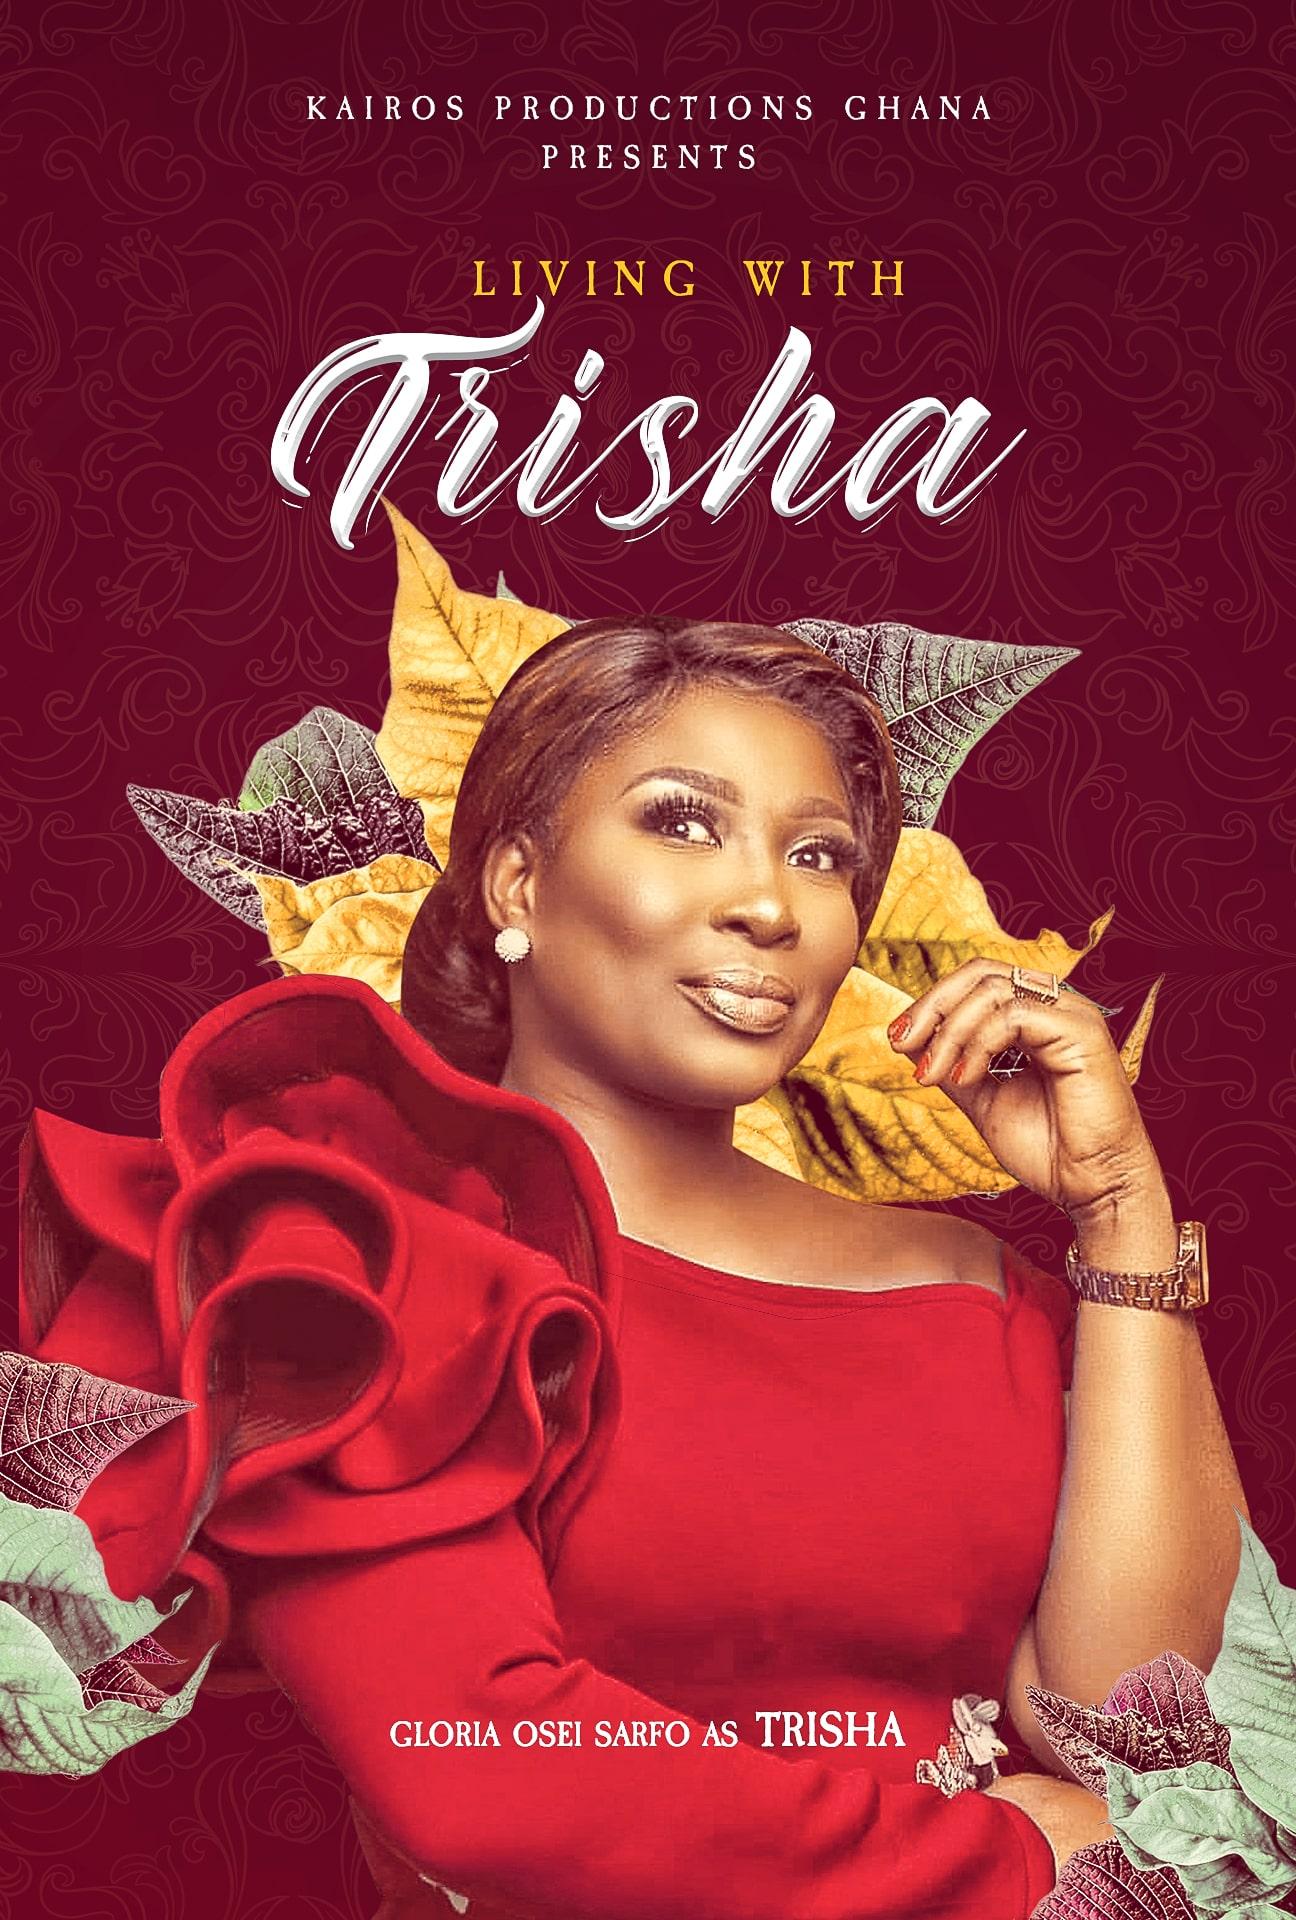 LIVING WITH TRISHA